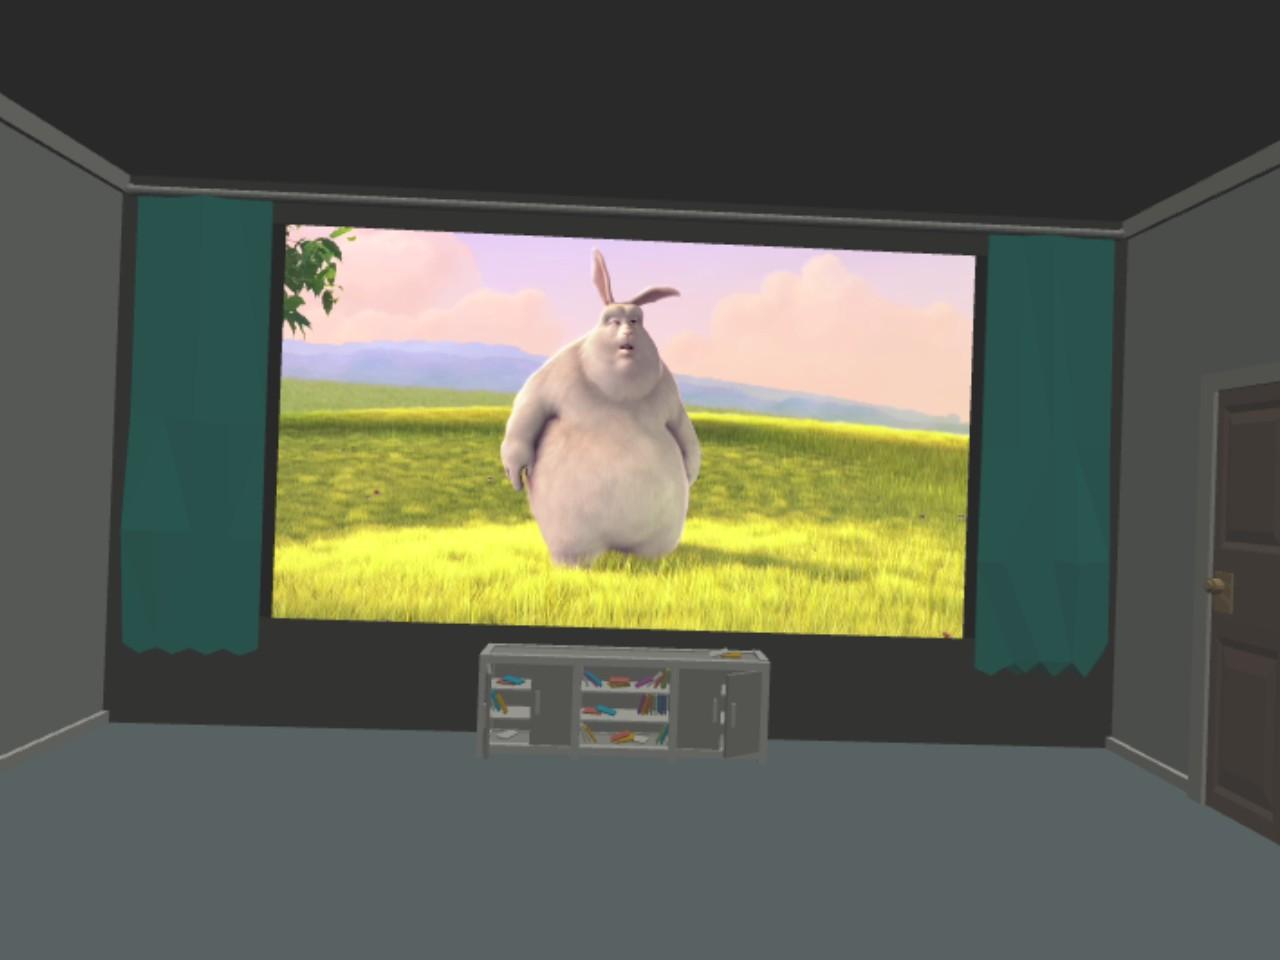 Chrome 79 Beta: Virtual Reality Comes to the Web